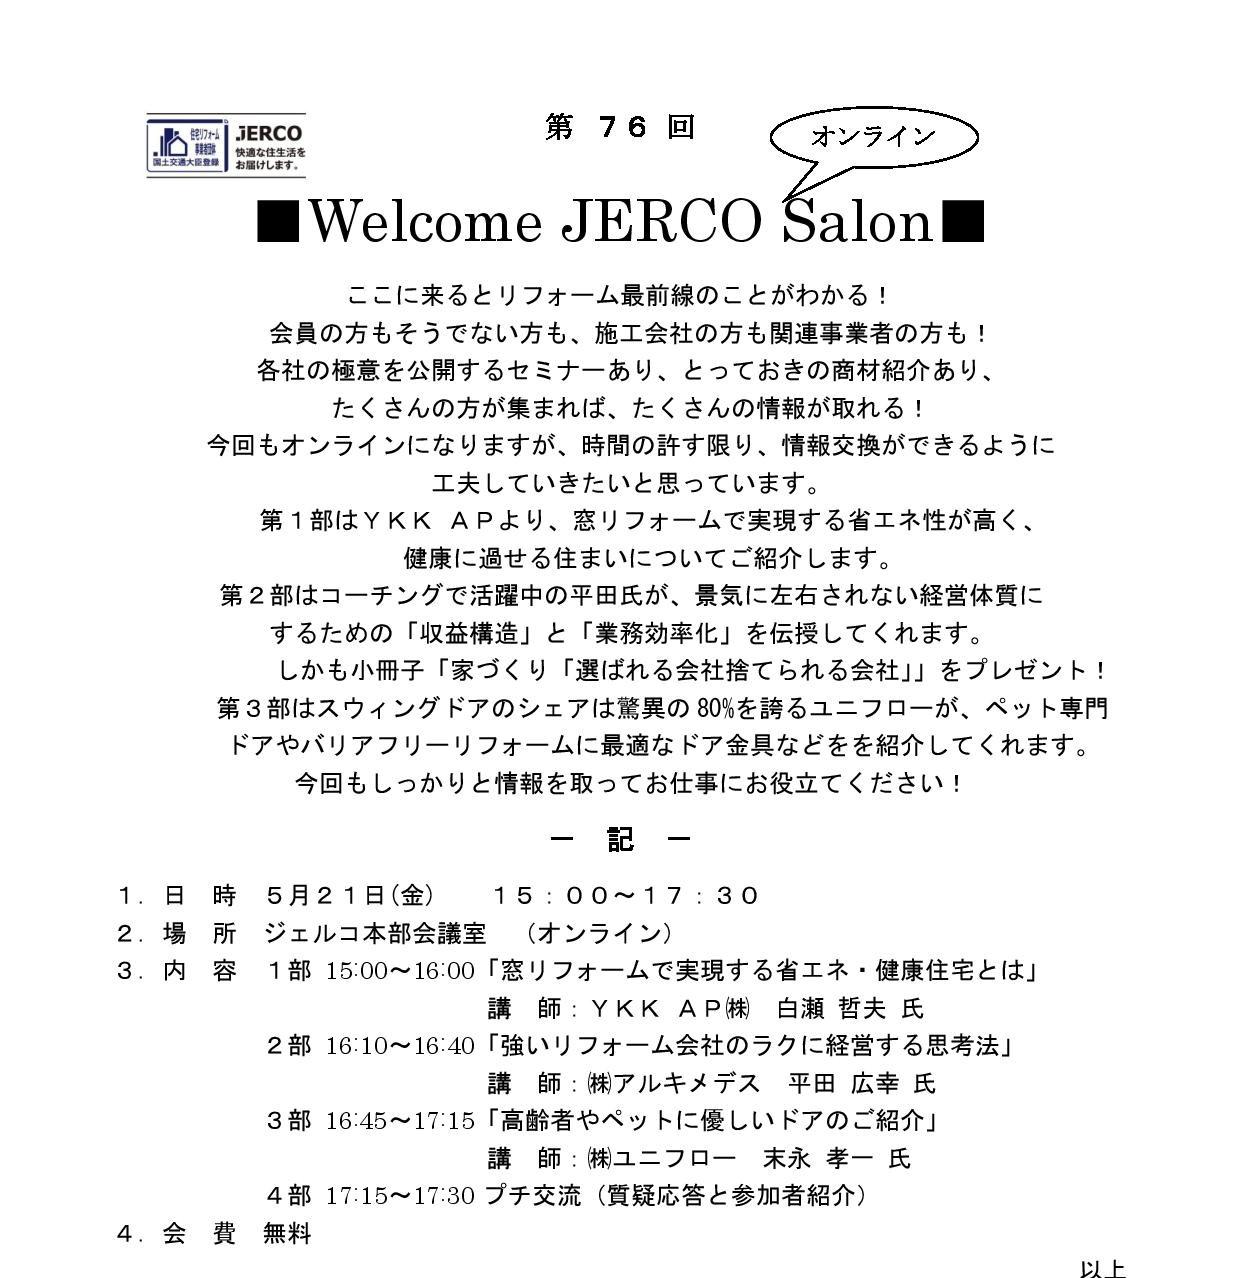 2021年5月21日(金)15:00~ Welcome JERCO Salon